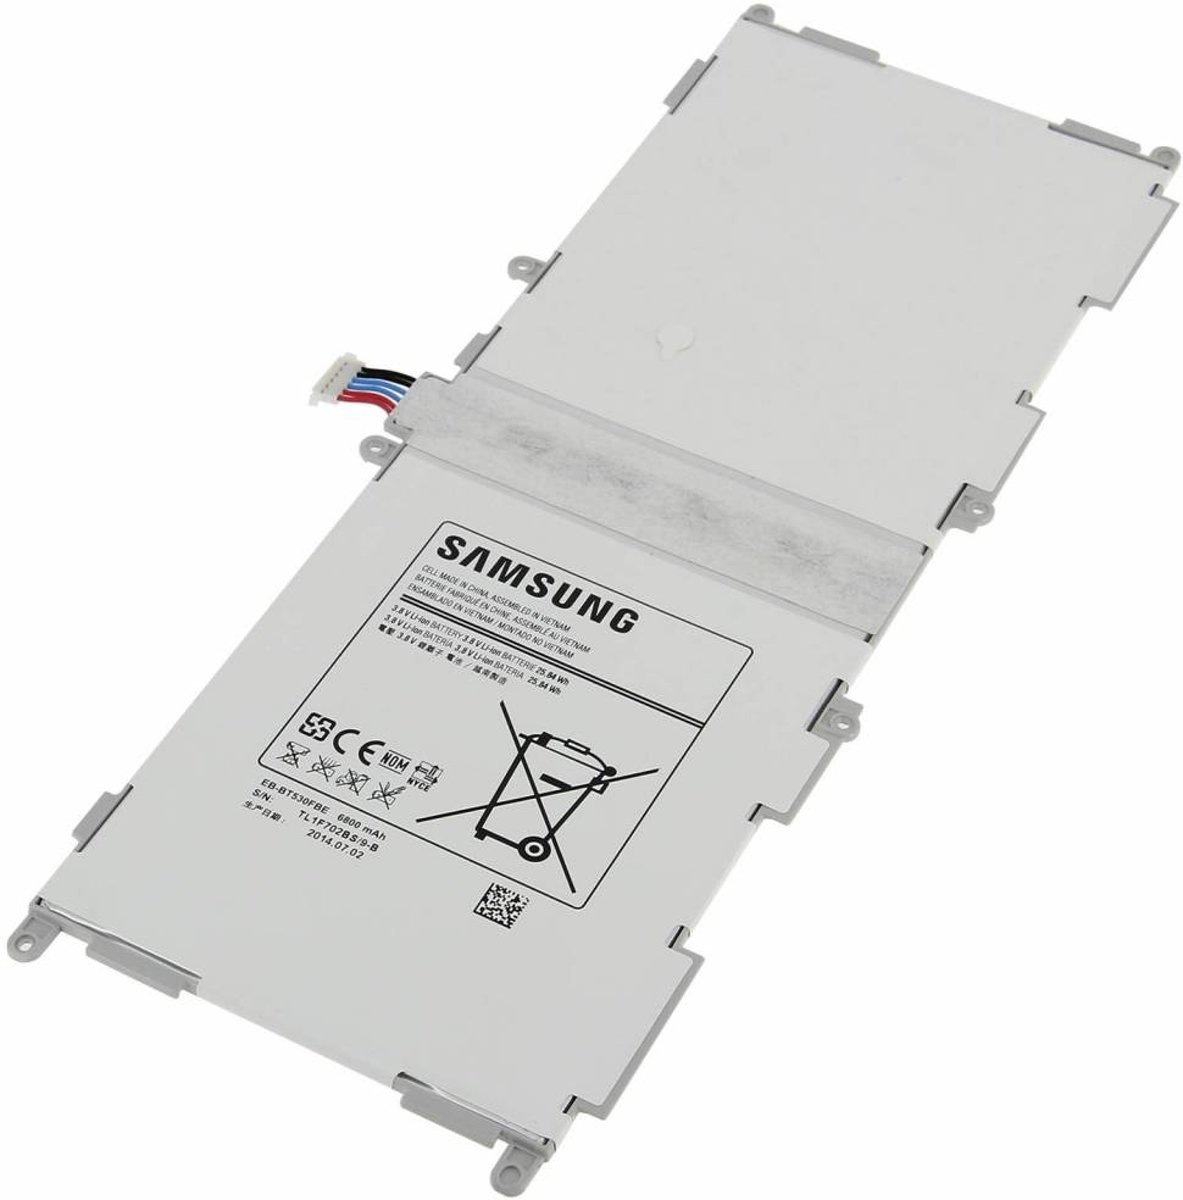 Accu / Batterij voor Samsung Galaxy Tab 4 10.1 T530 - EB-BT530FBE - 6800mAh kopen